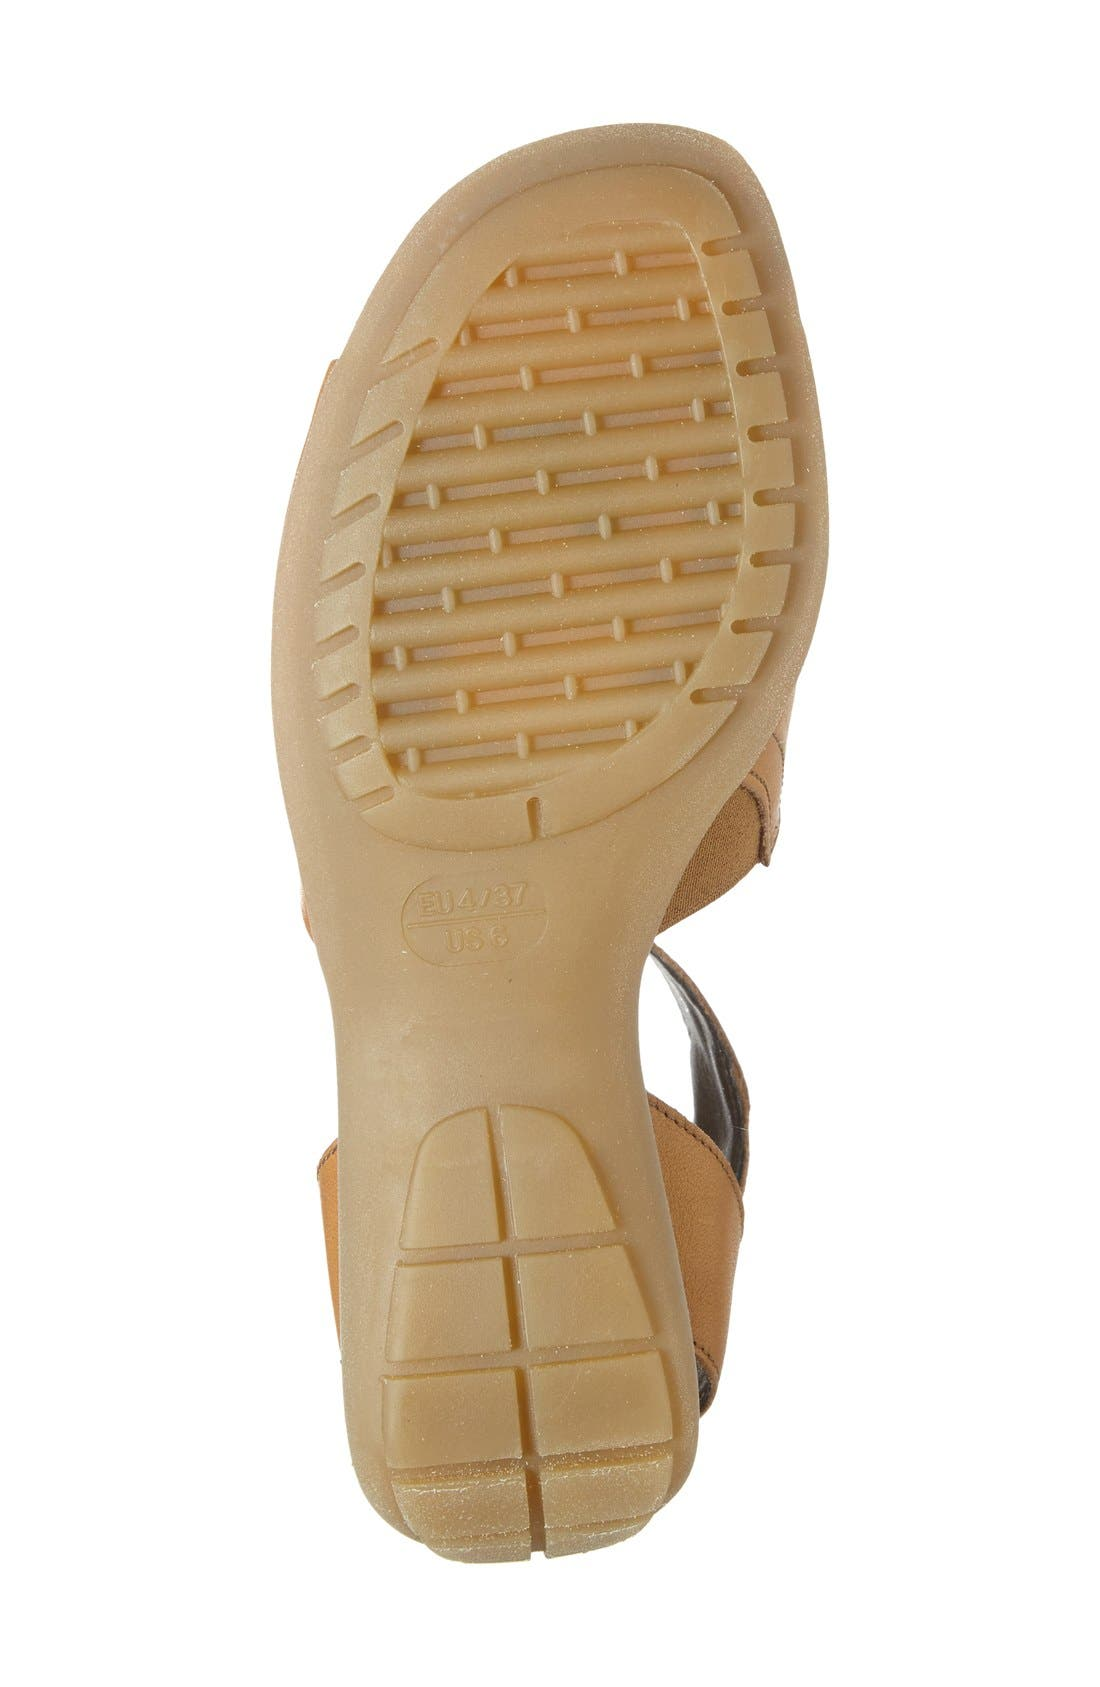 'Beglad' Leather Ankle Strap Sandal,                             Alternate thumbnail 4, color,                             Virginia Brown Leather